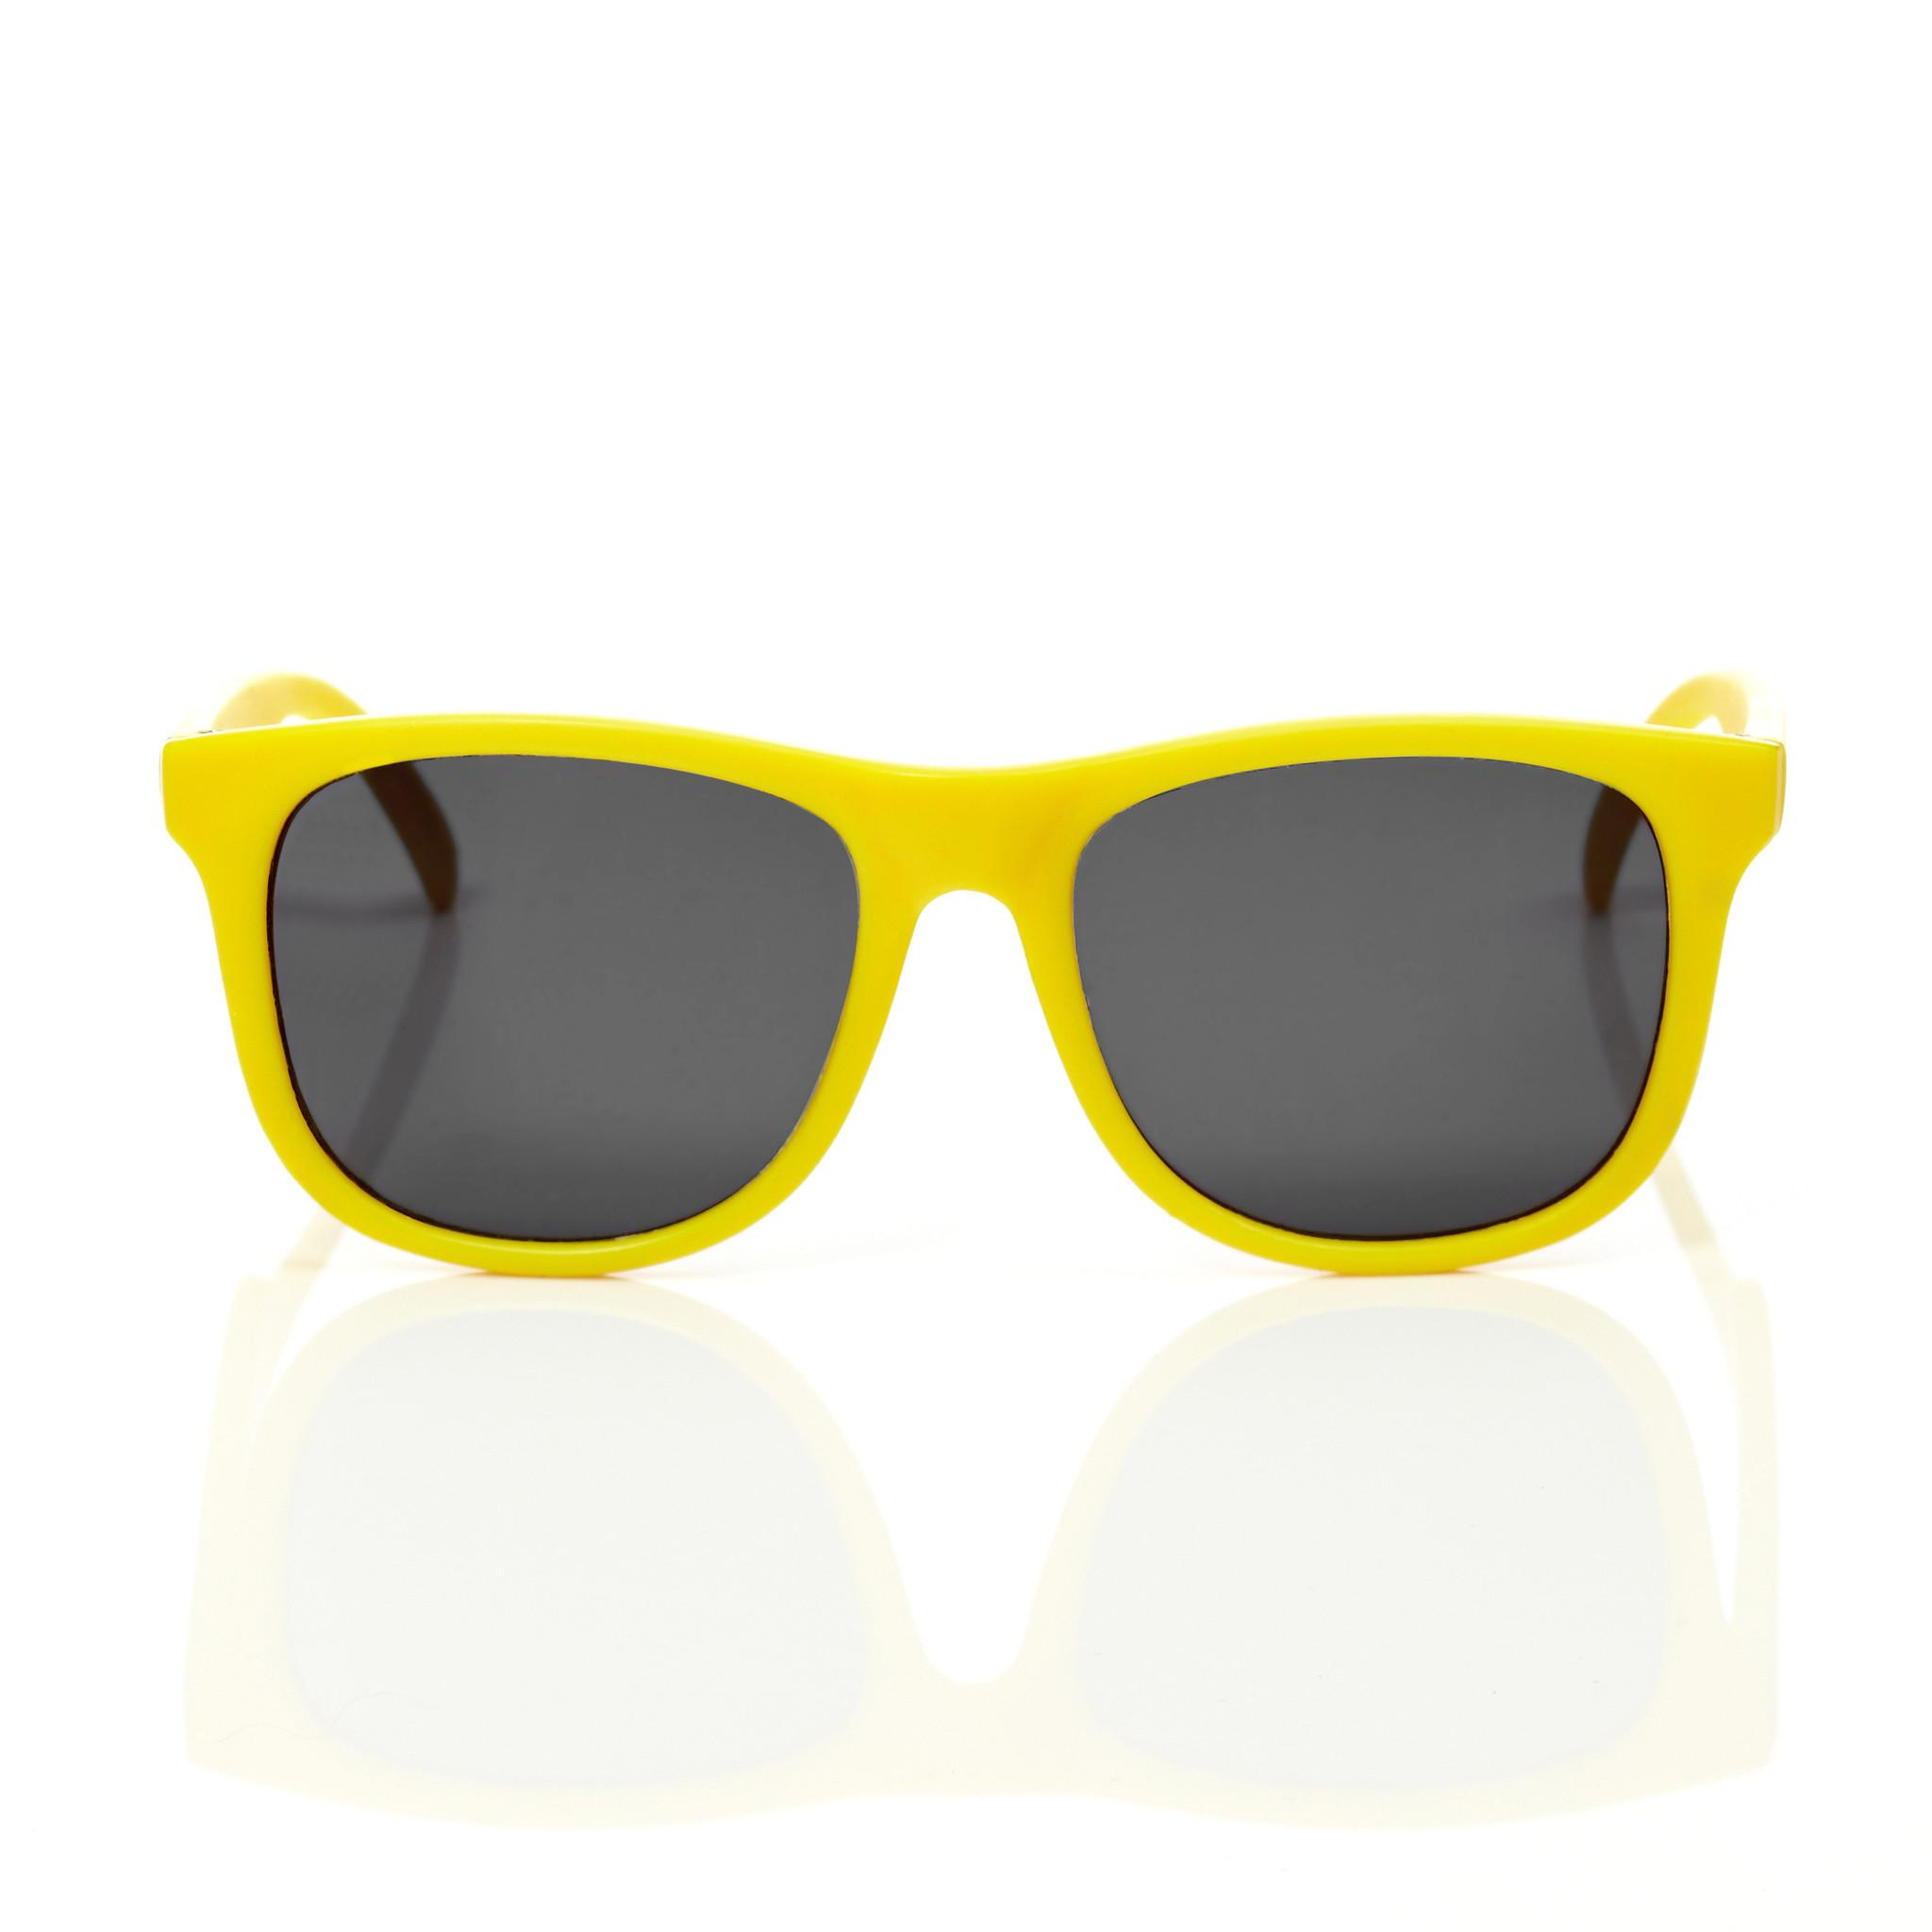 Mustachifier Yellow Sunglasses Age 3-6 แว่นกันแดดเด็กสีเหลือง สำเนา